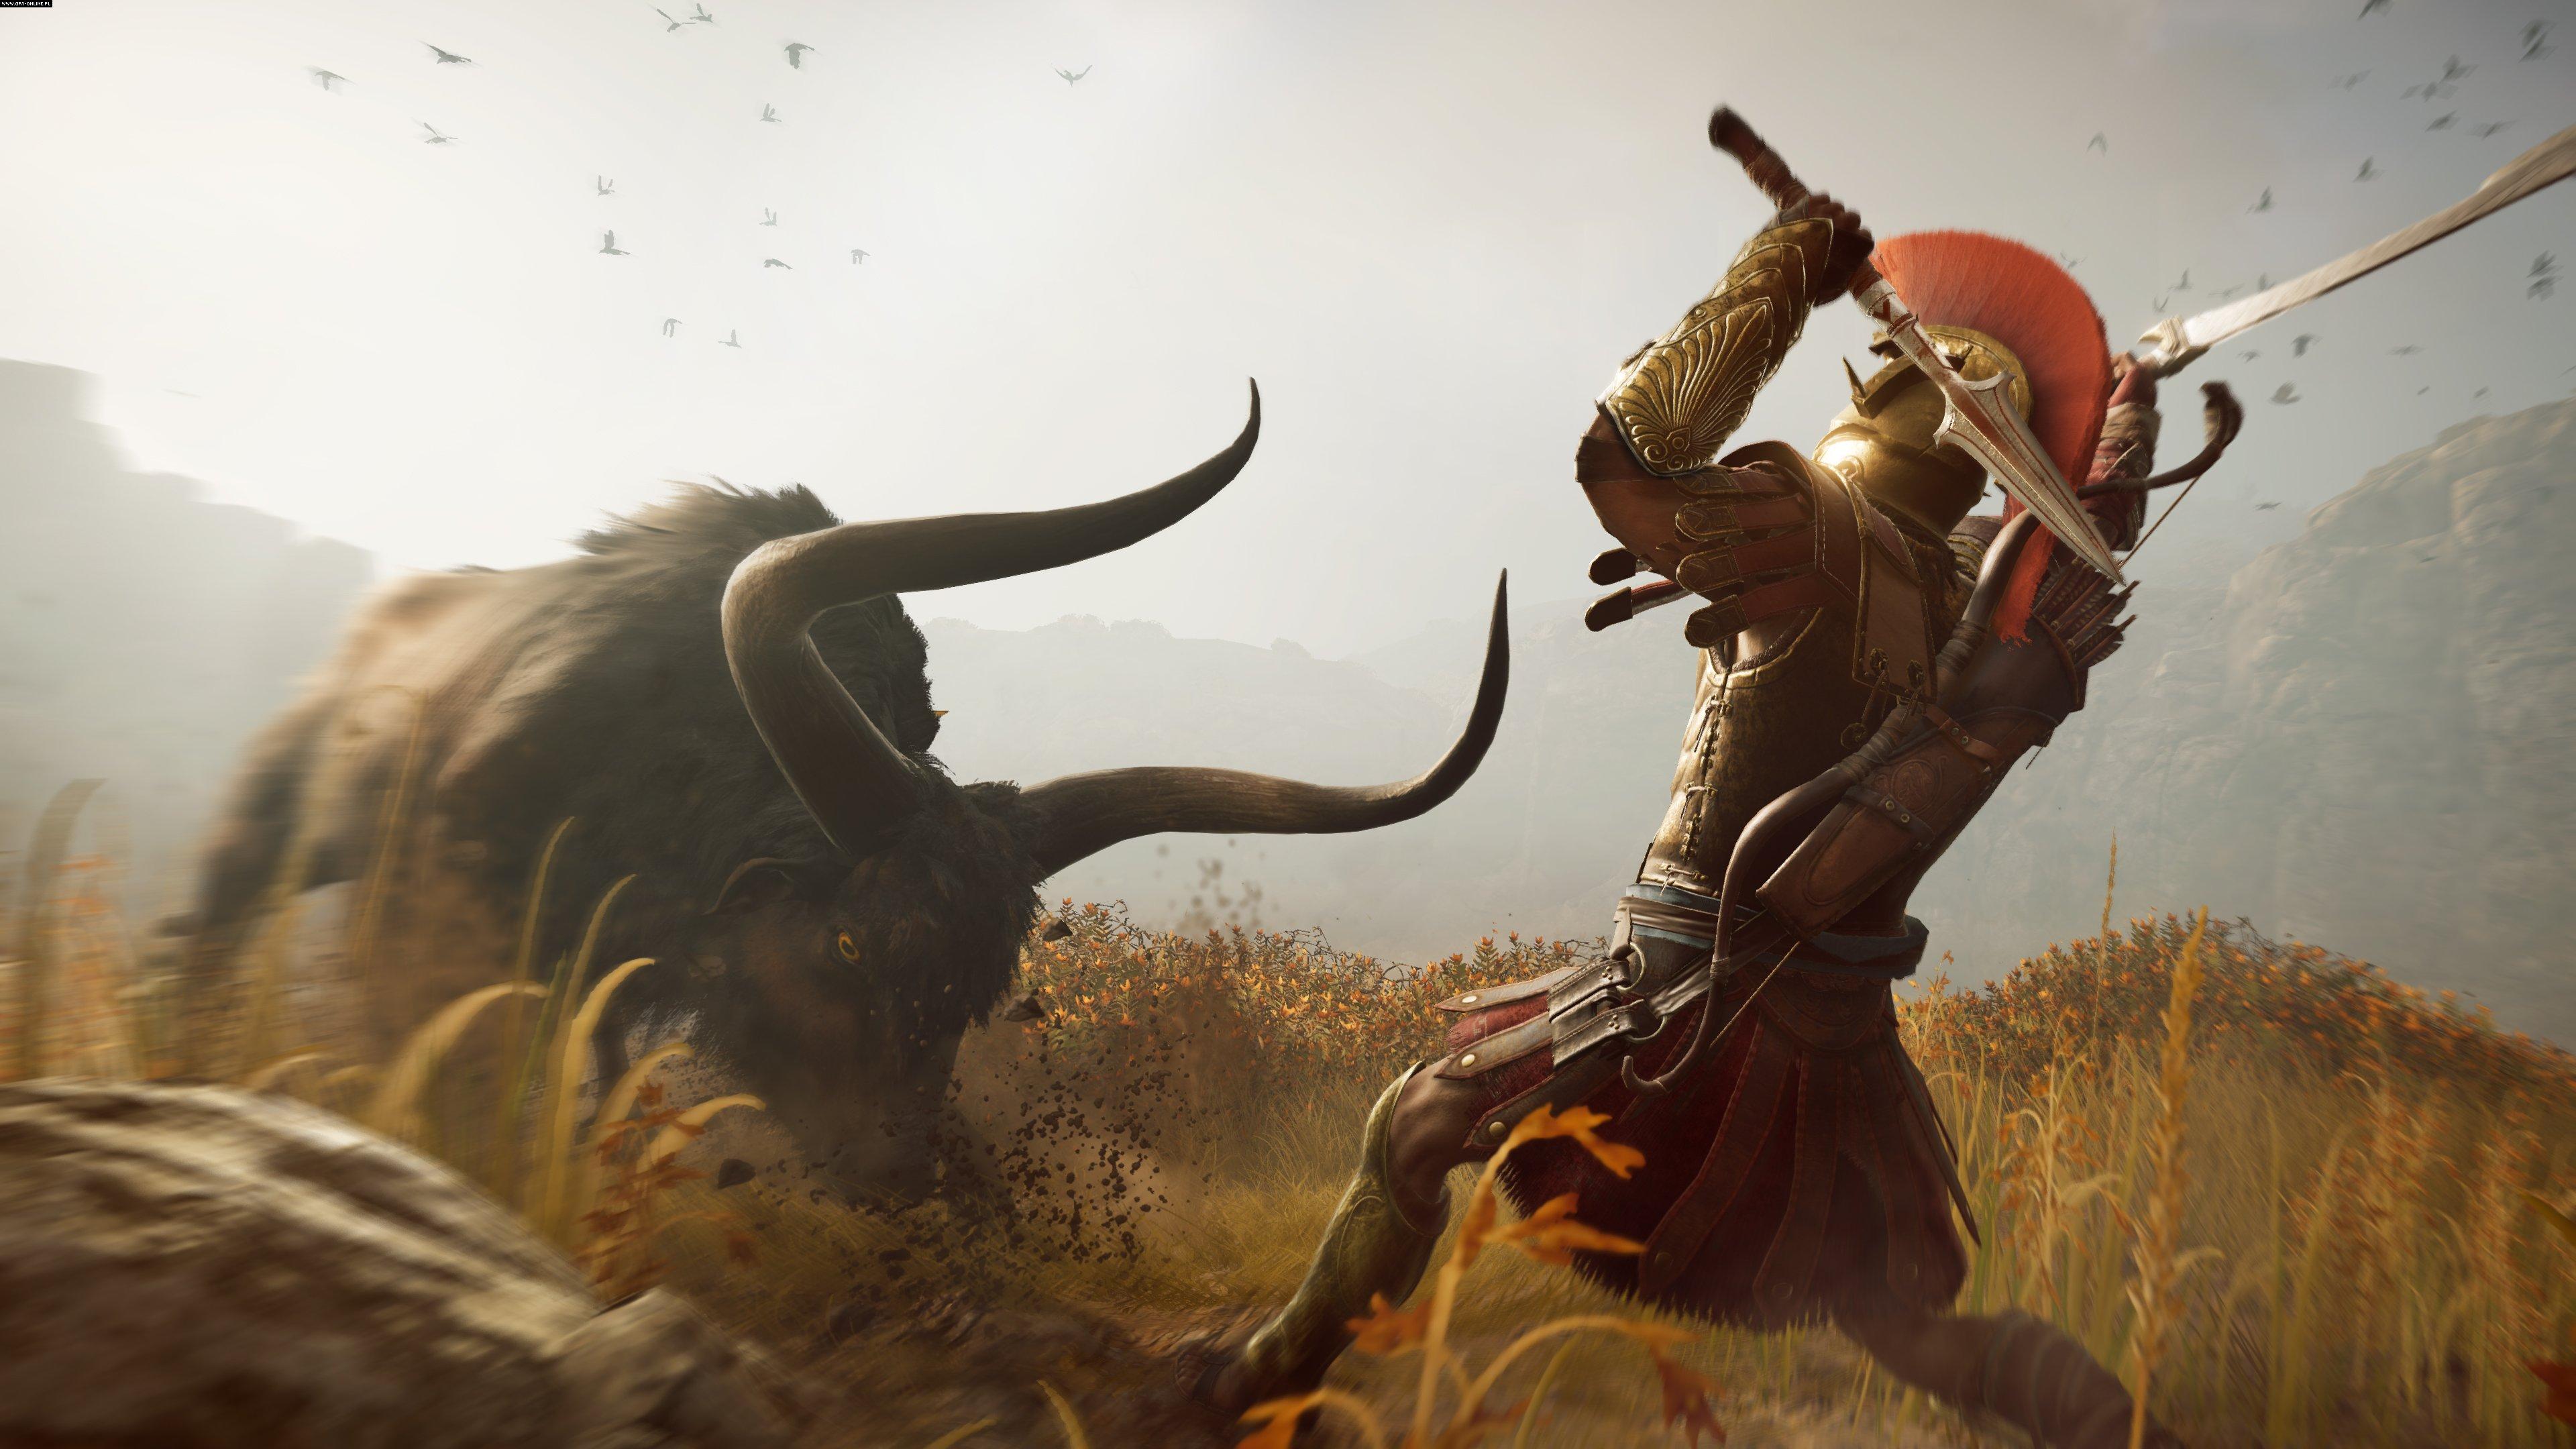 Assassin's Creed Odyssey PC, PS4, XONE Games Image 19/47, Ubisoft